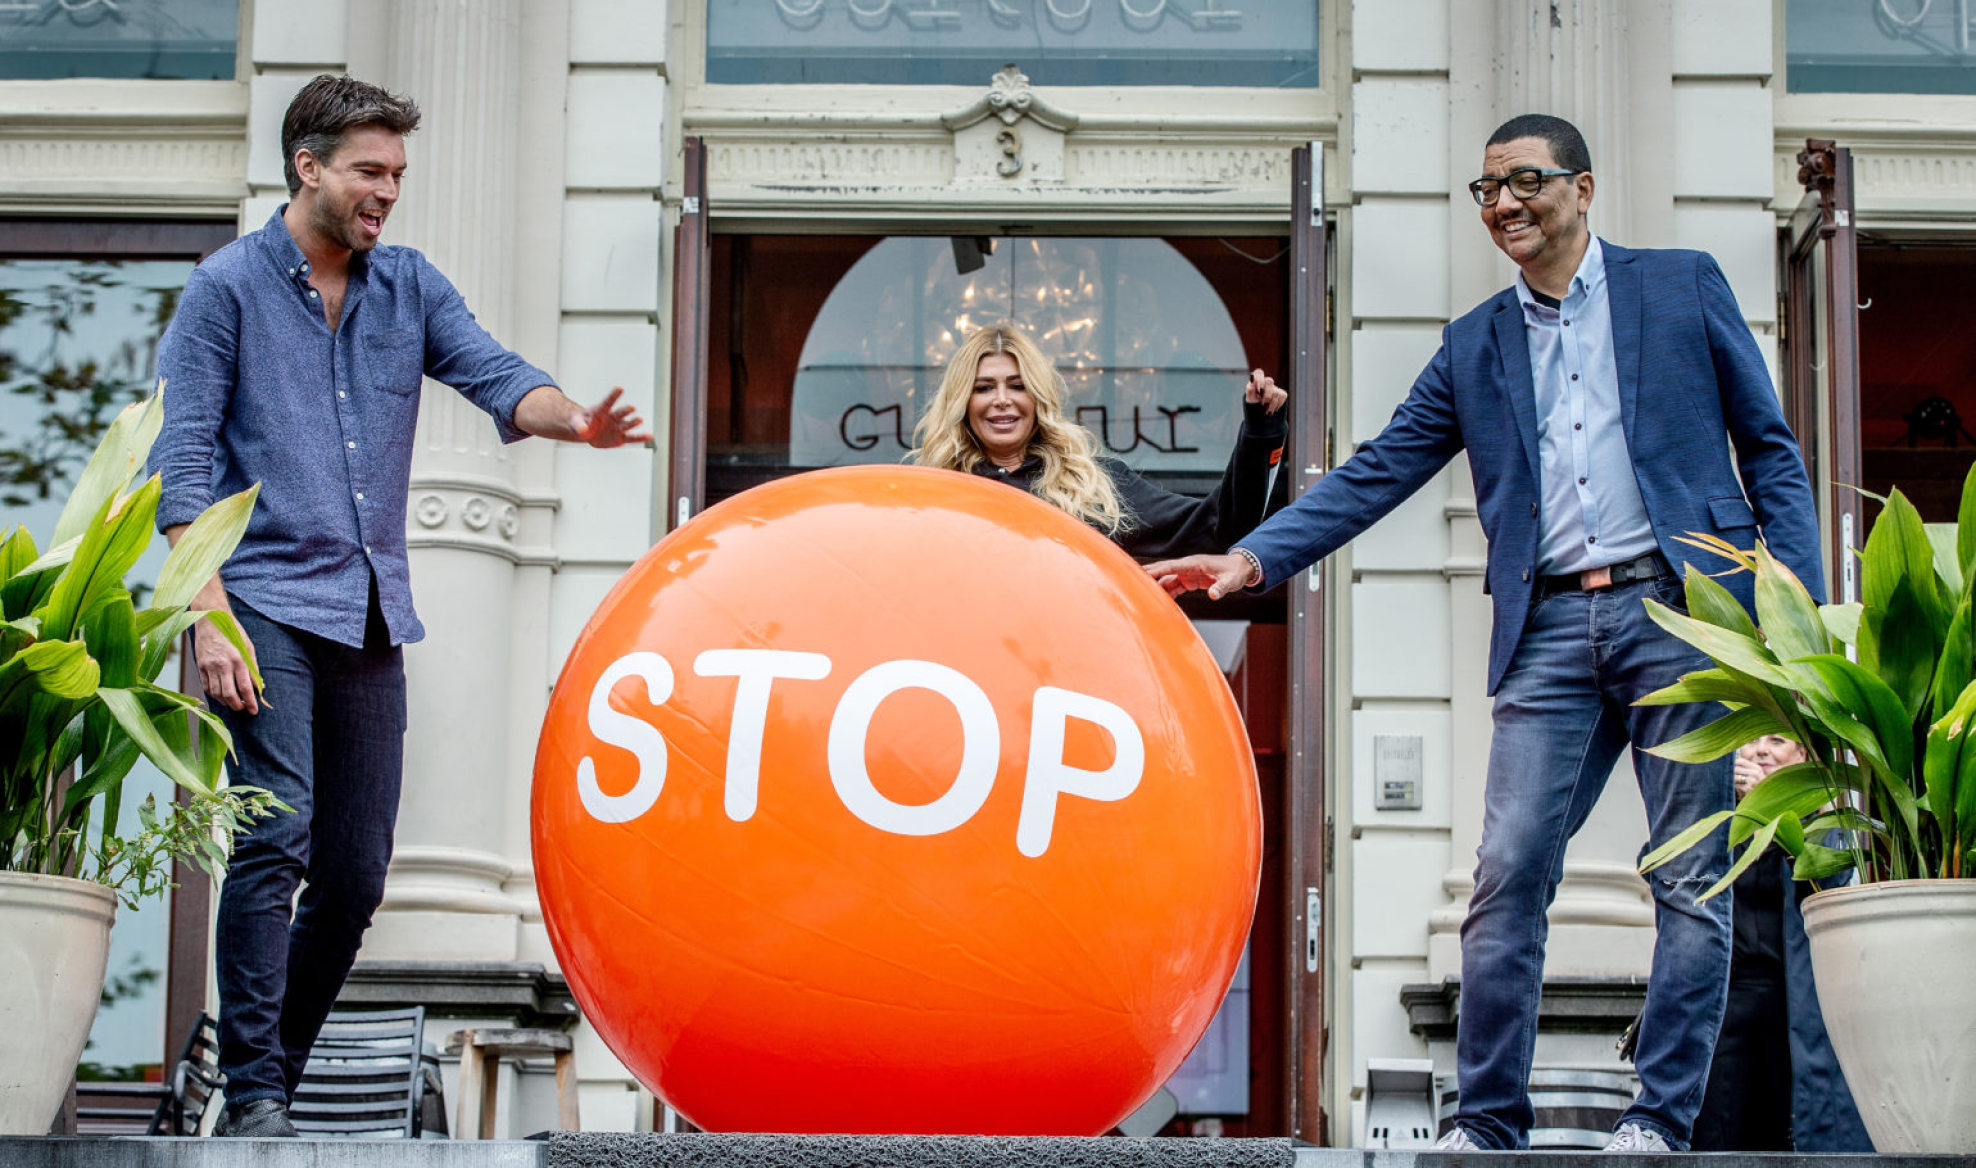 bron: stoptober.nl